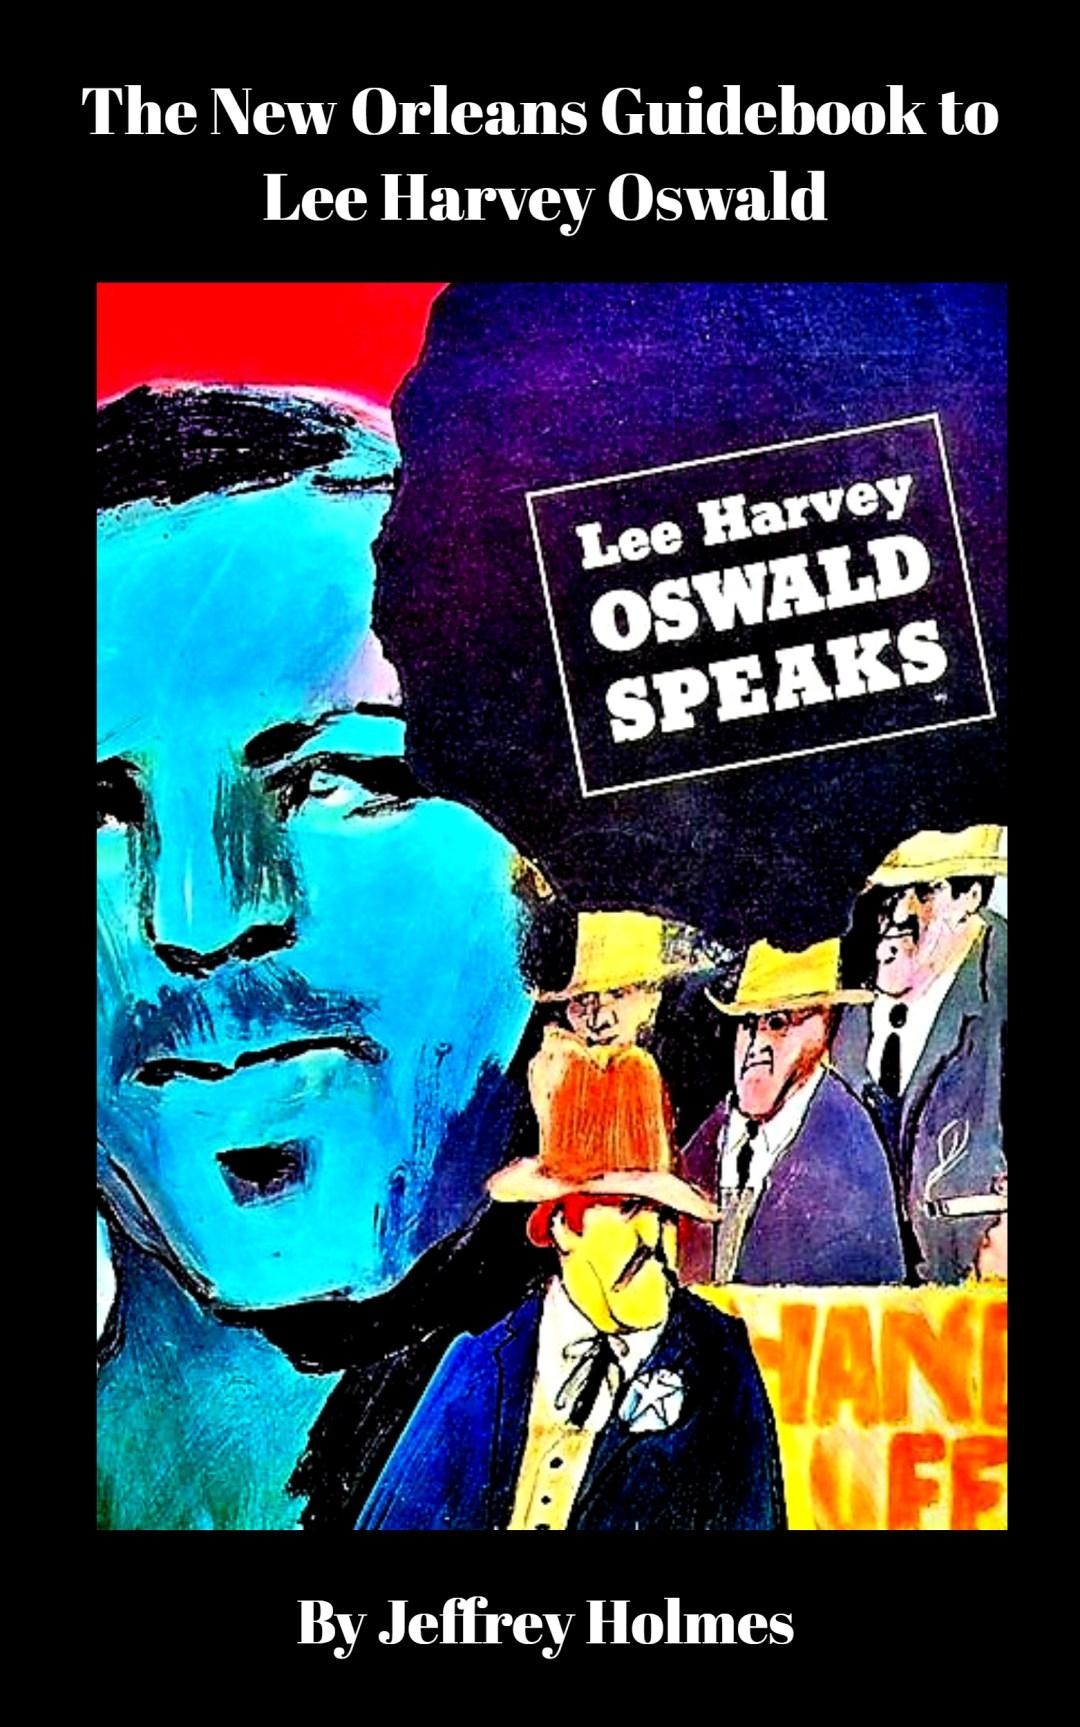 Lee Harvey Oswald of JFK conspiracy